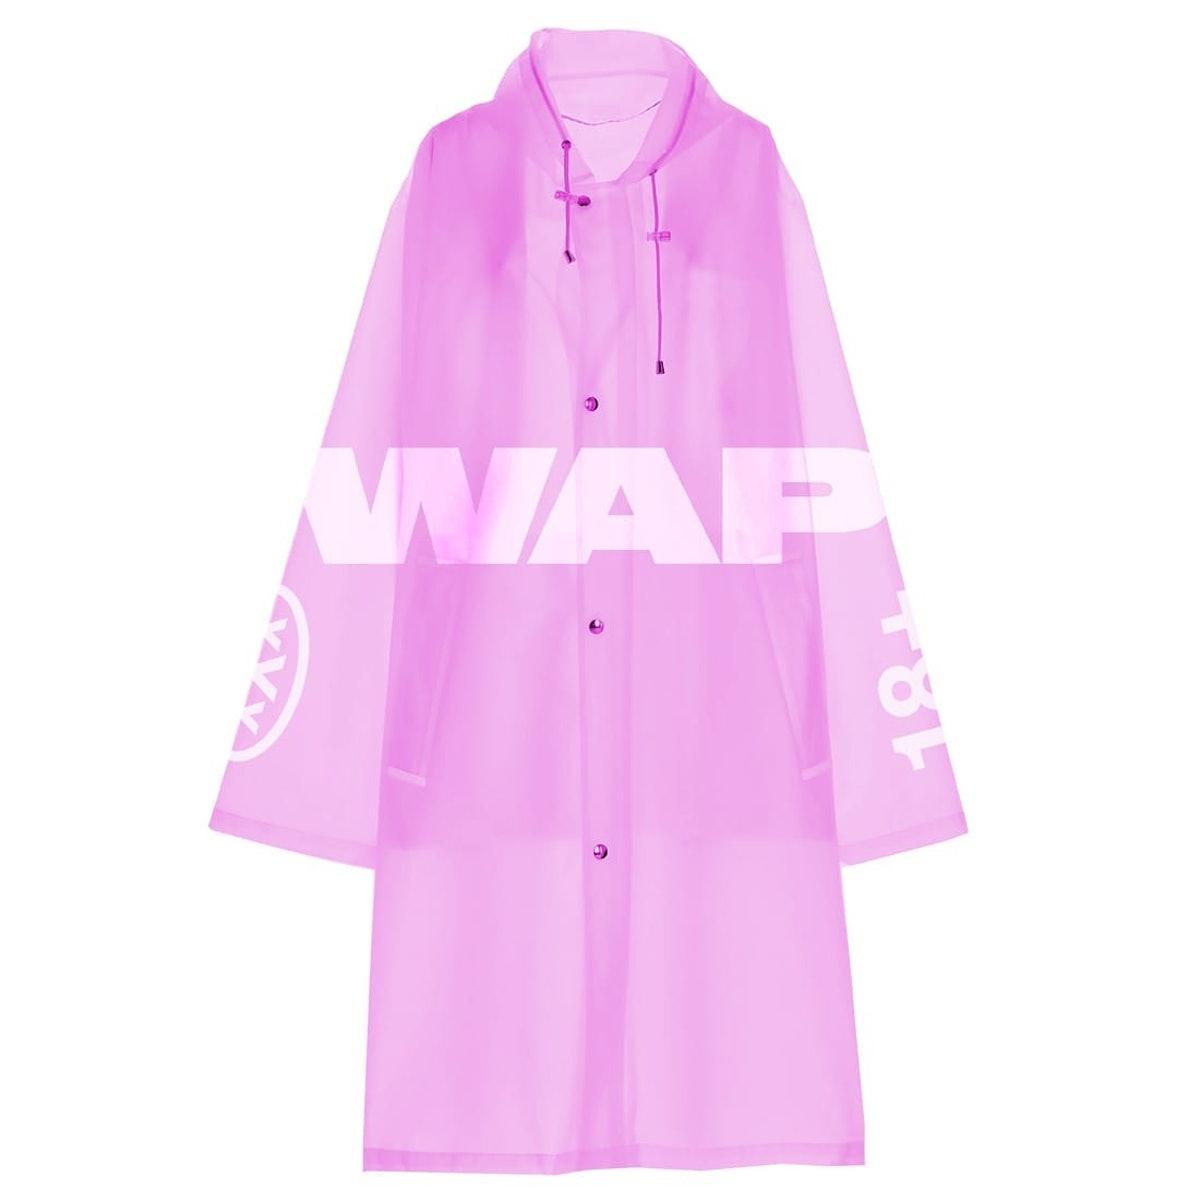 WAP Raincoat (Pink)